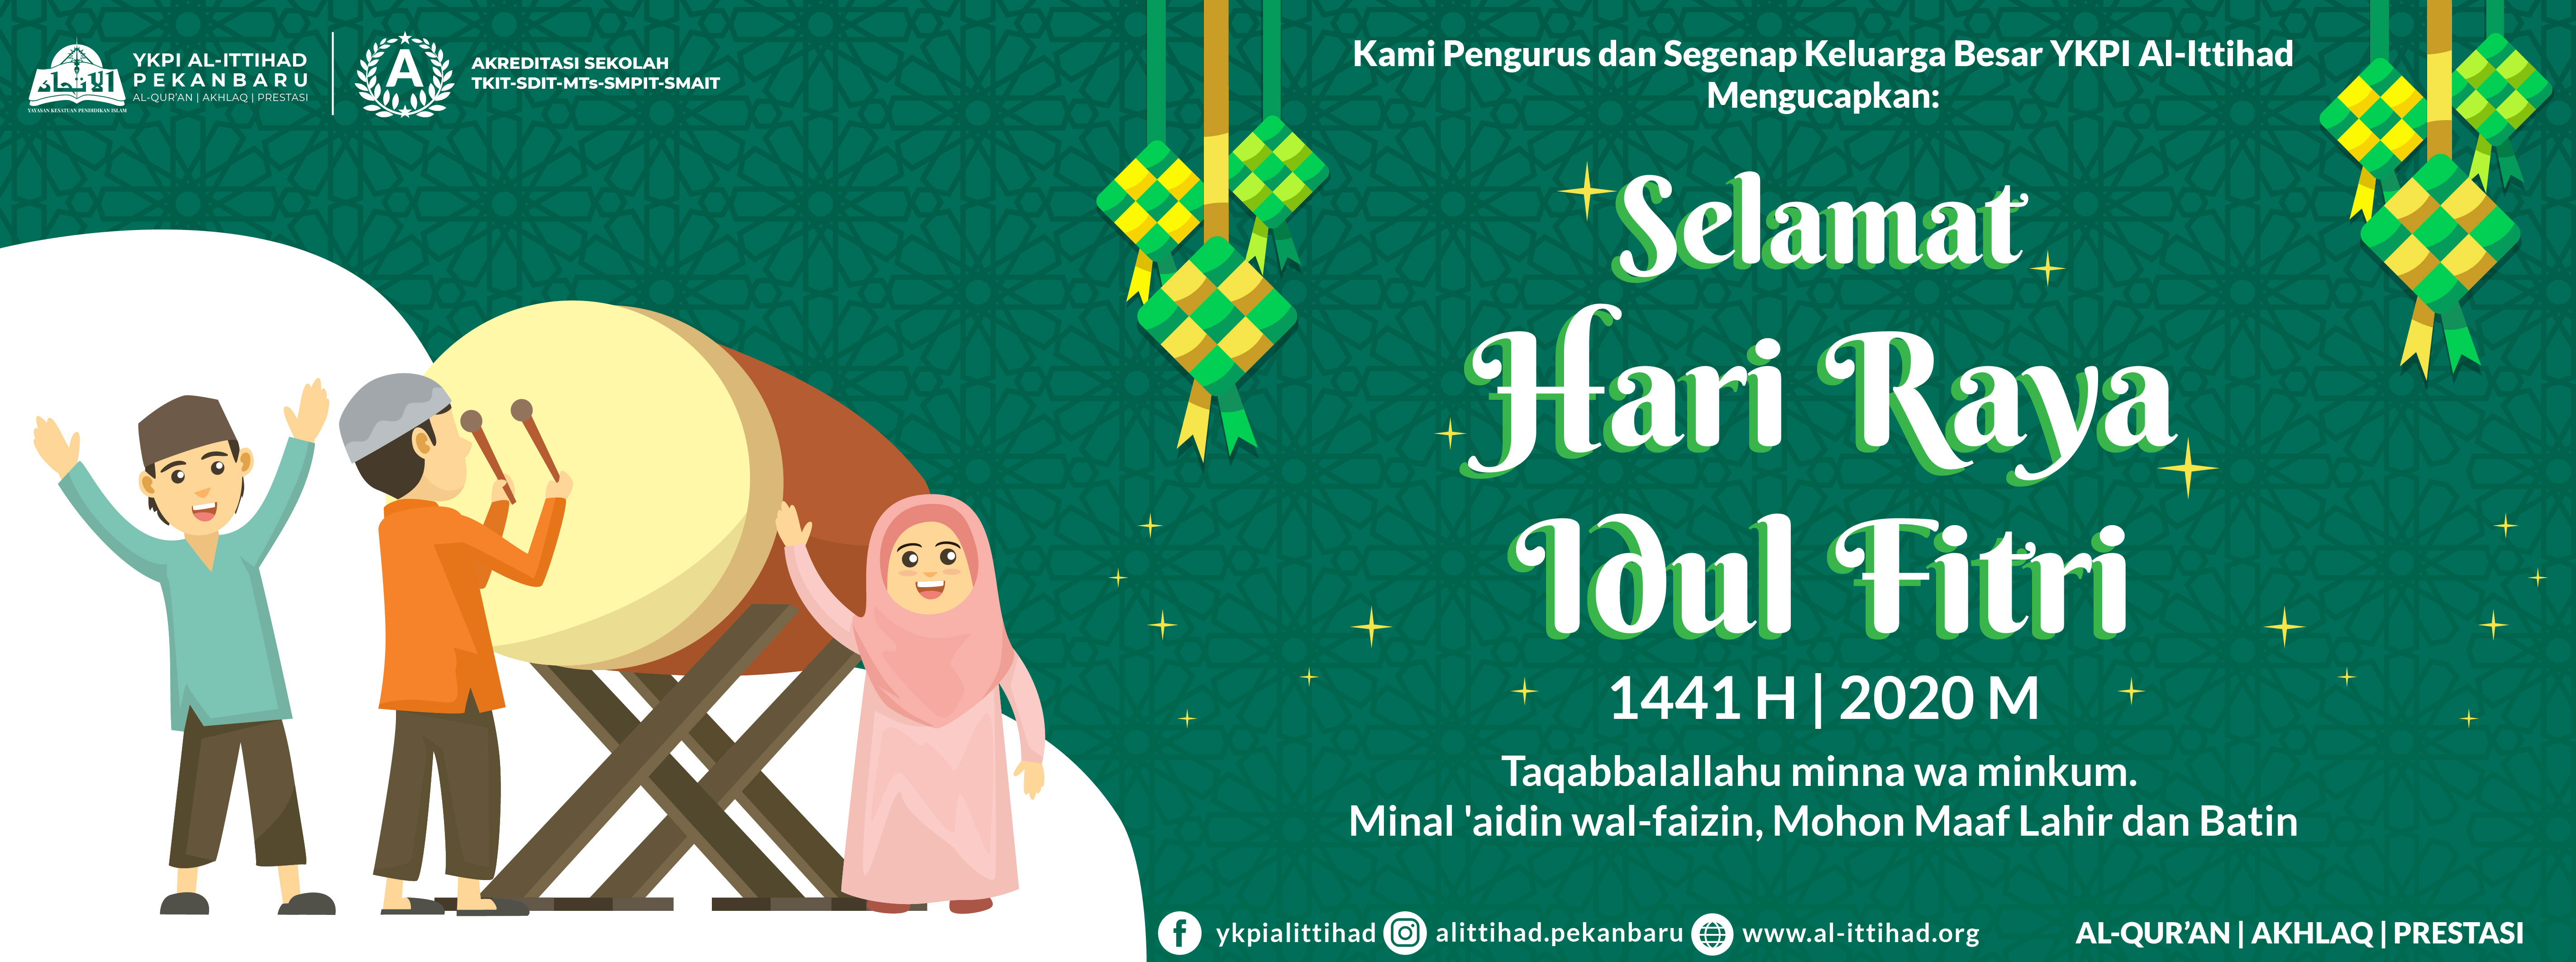 Selamat Idul Fitri 1441H 2020M